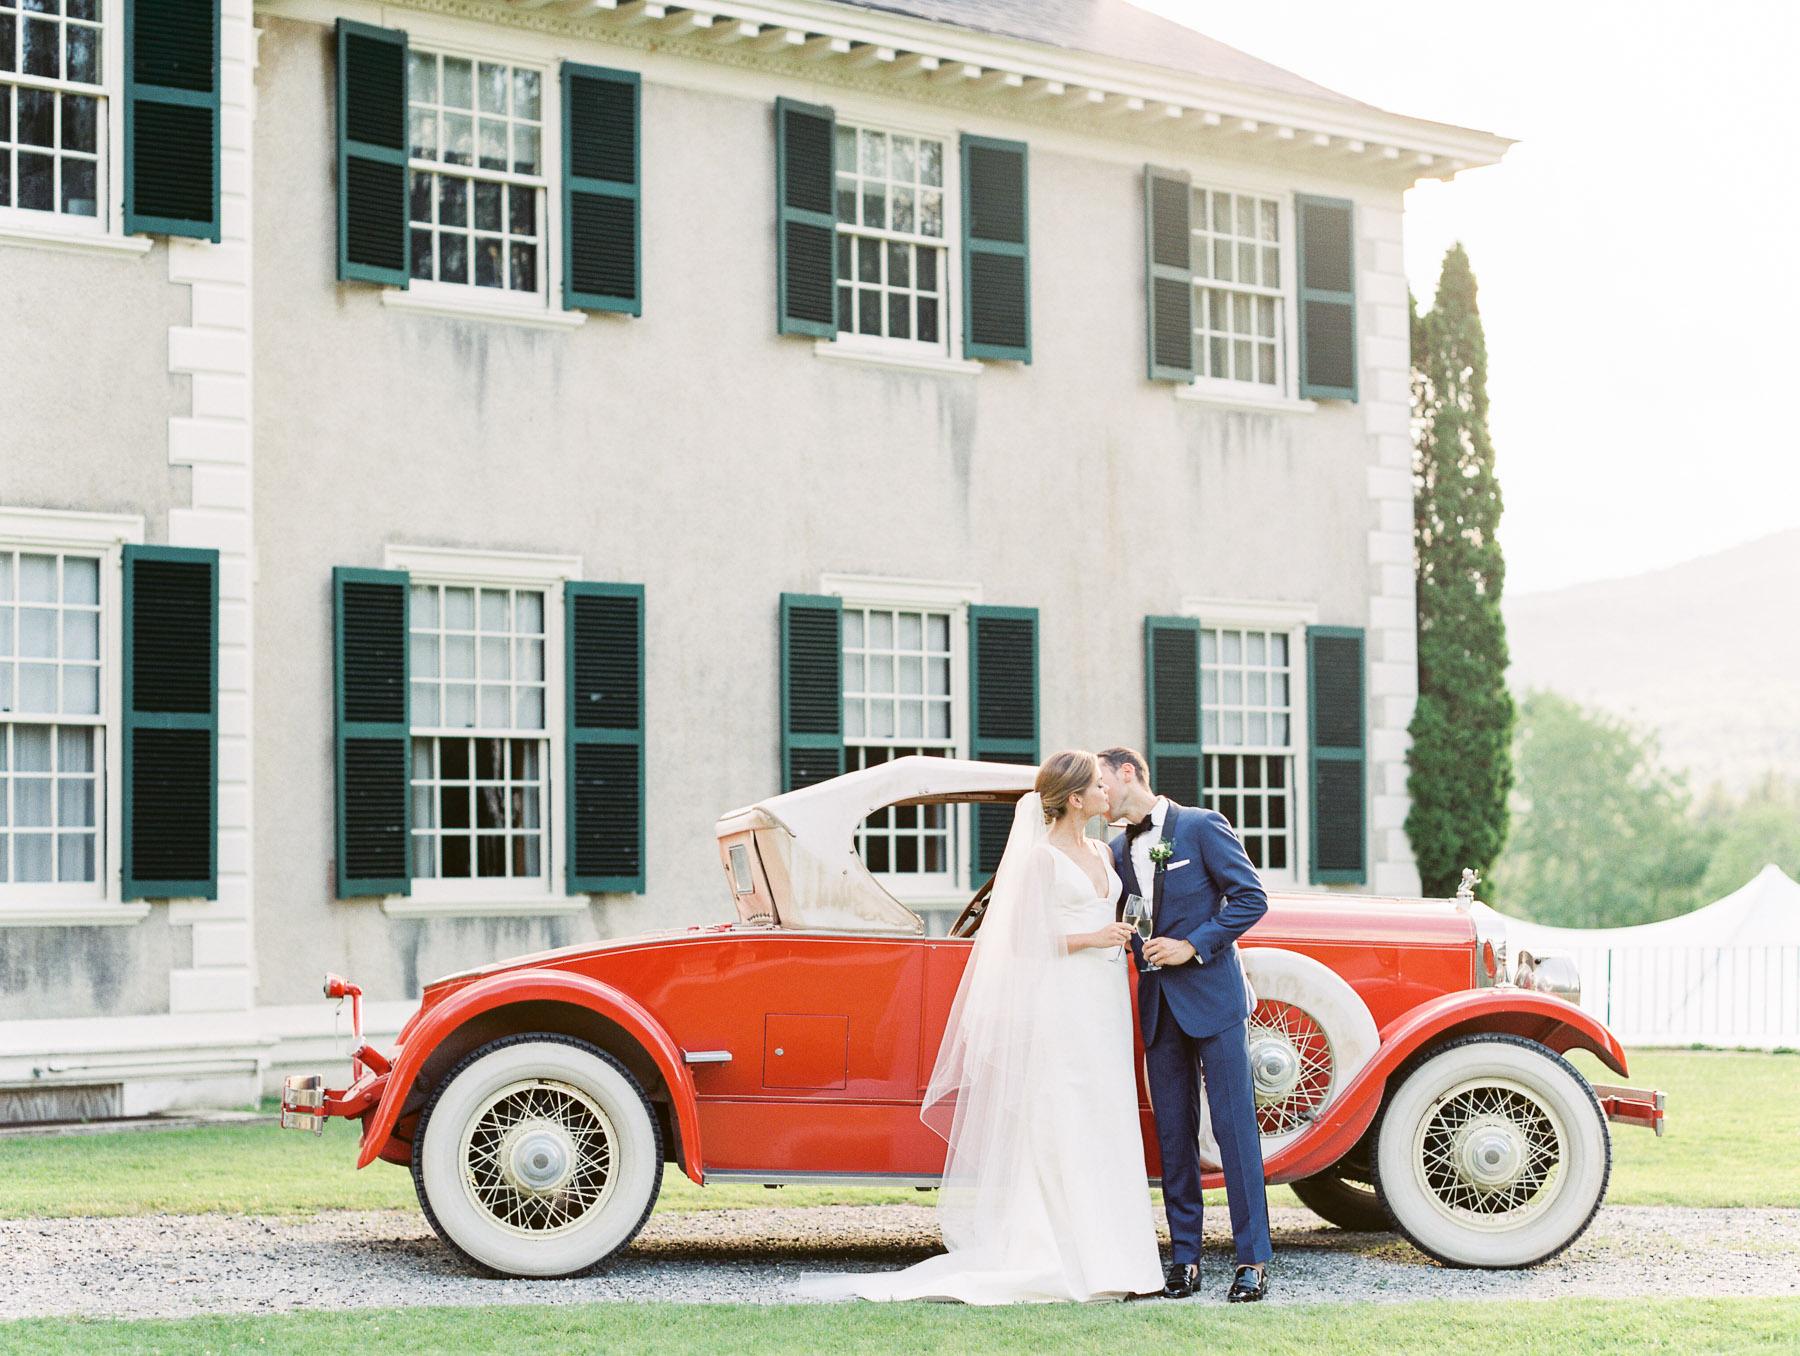 Manchester Vermont Wedding Vintage Red Car at Hildene Estate